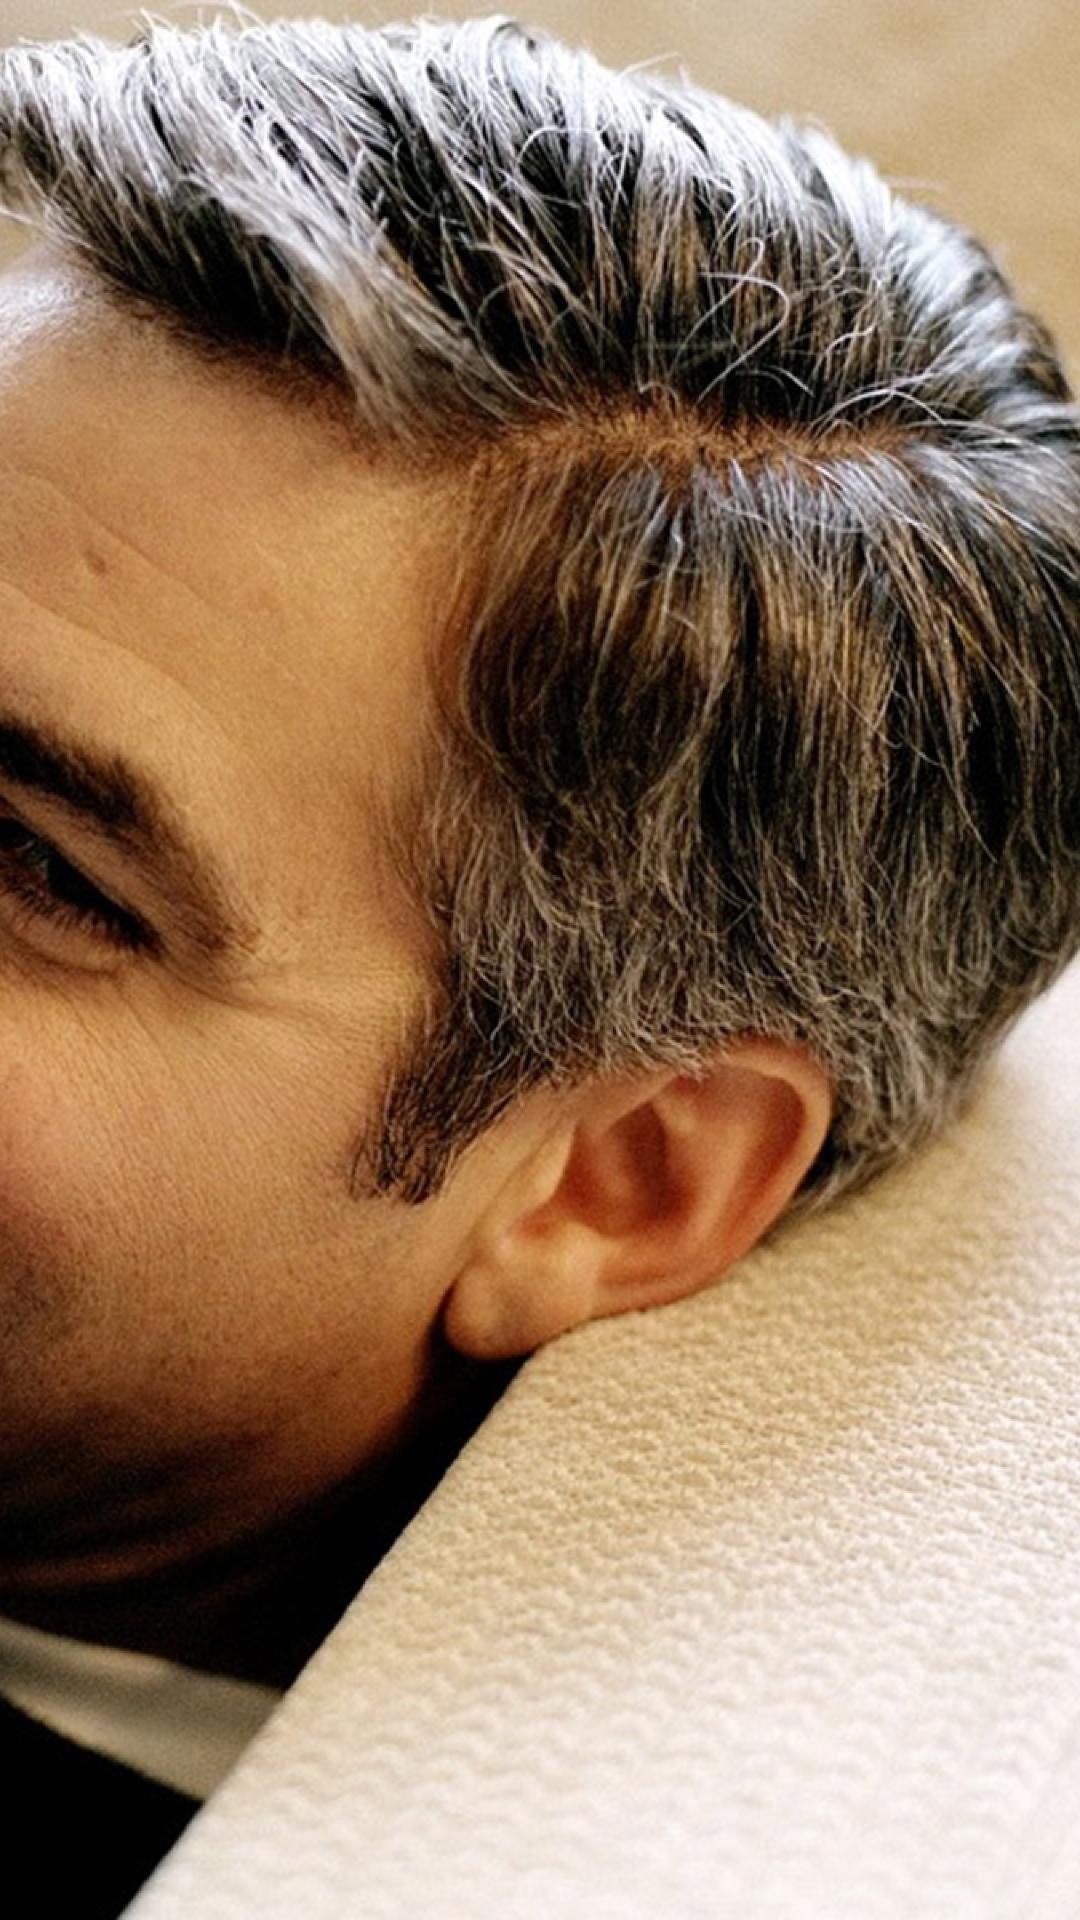 George Clooney Smile wallpaper 1080x1920